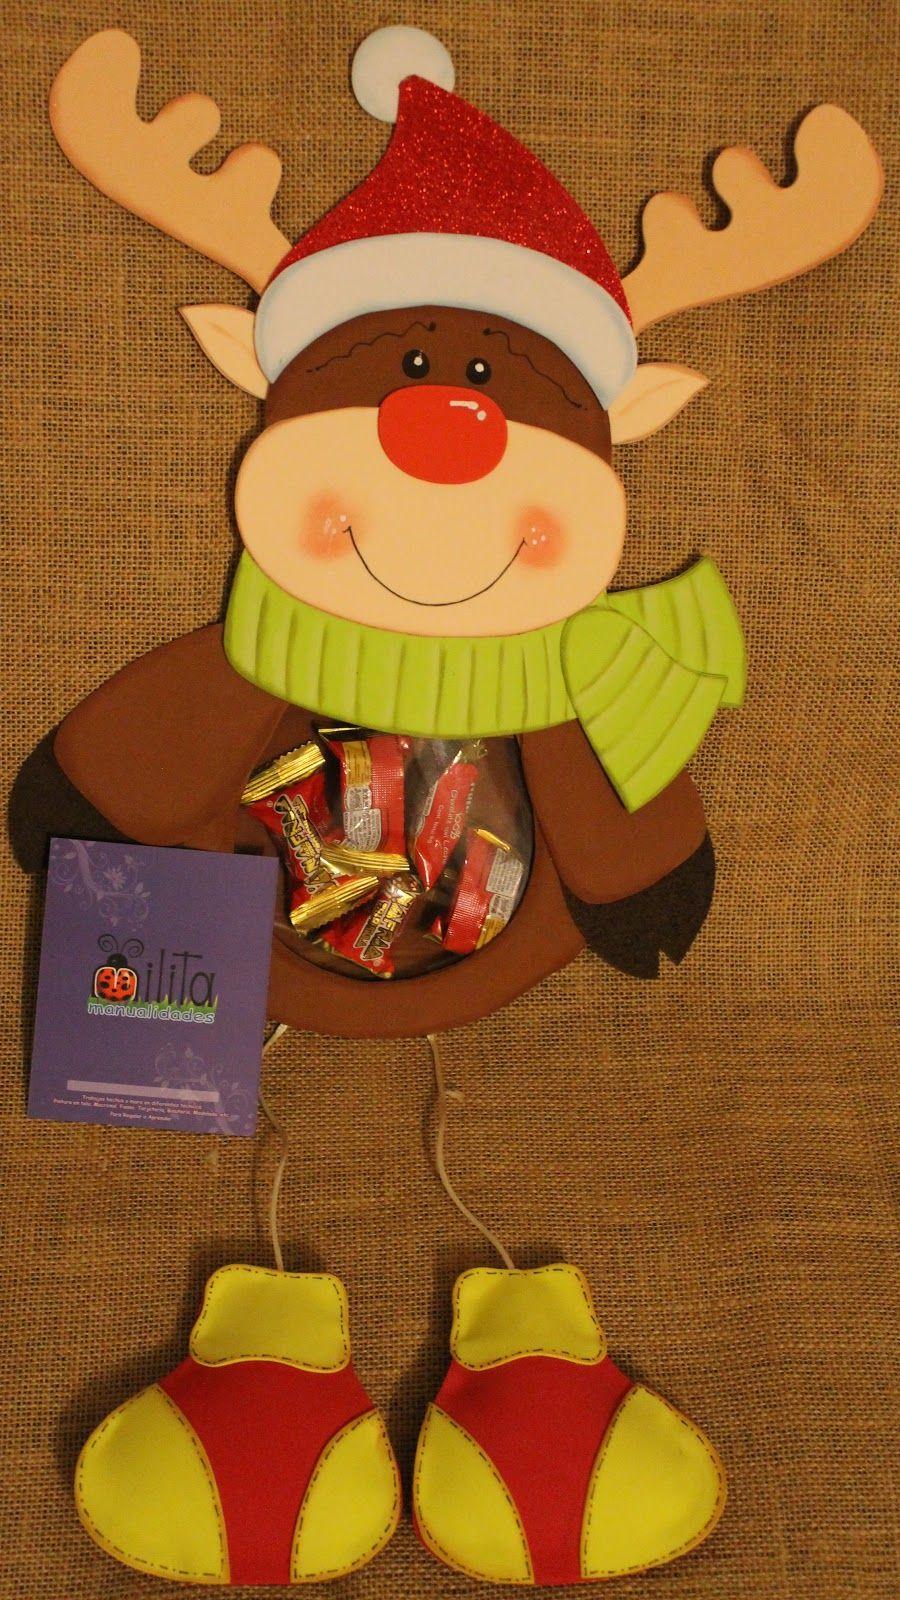 Trabajos manuales de navidad milita manualidades for Manualidades souvenirs navidenos